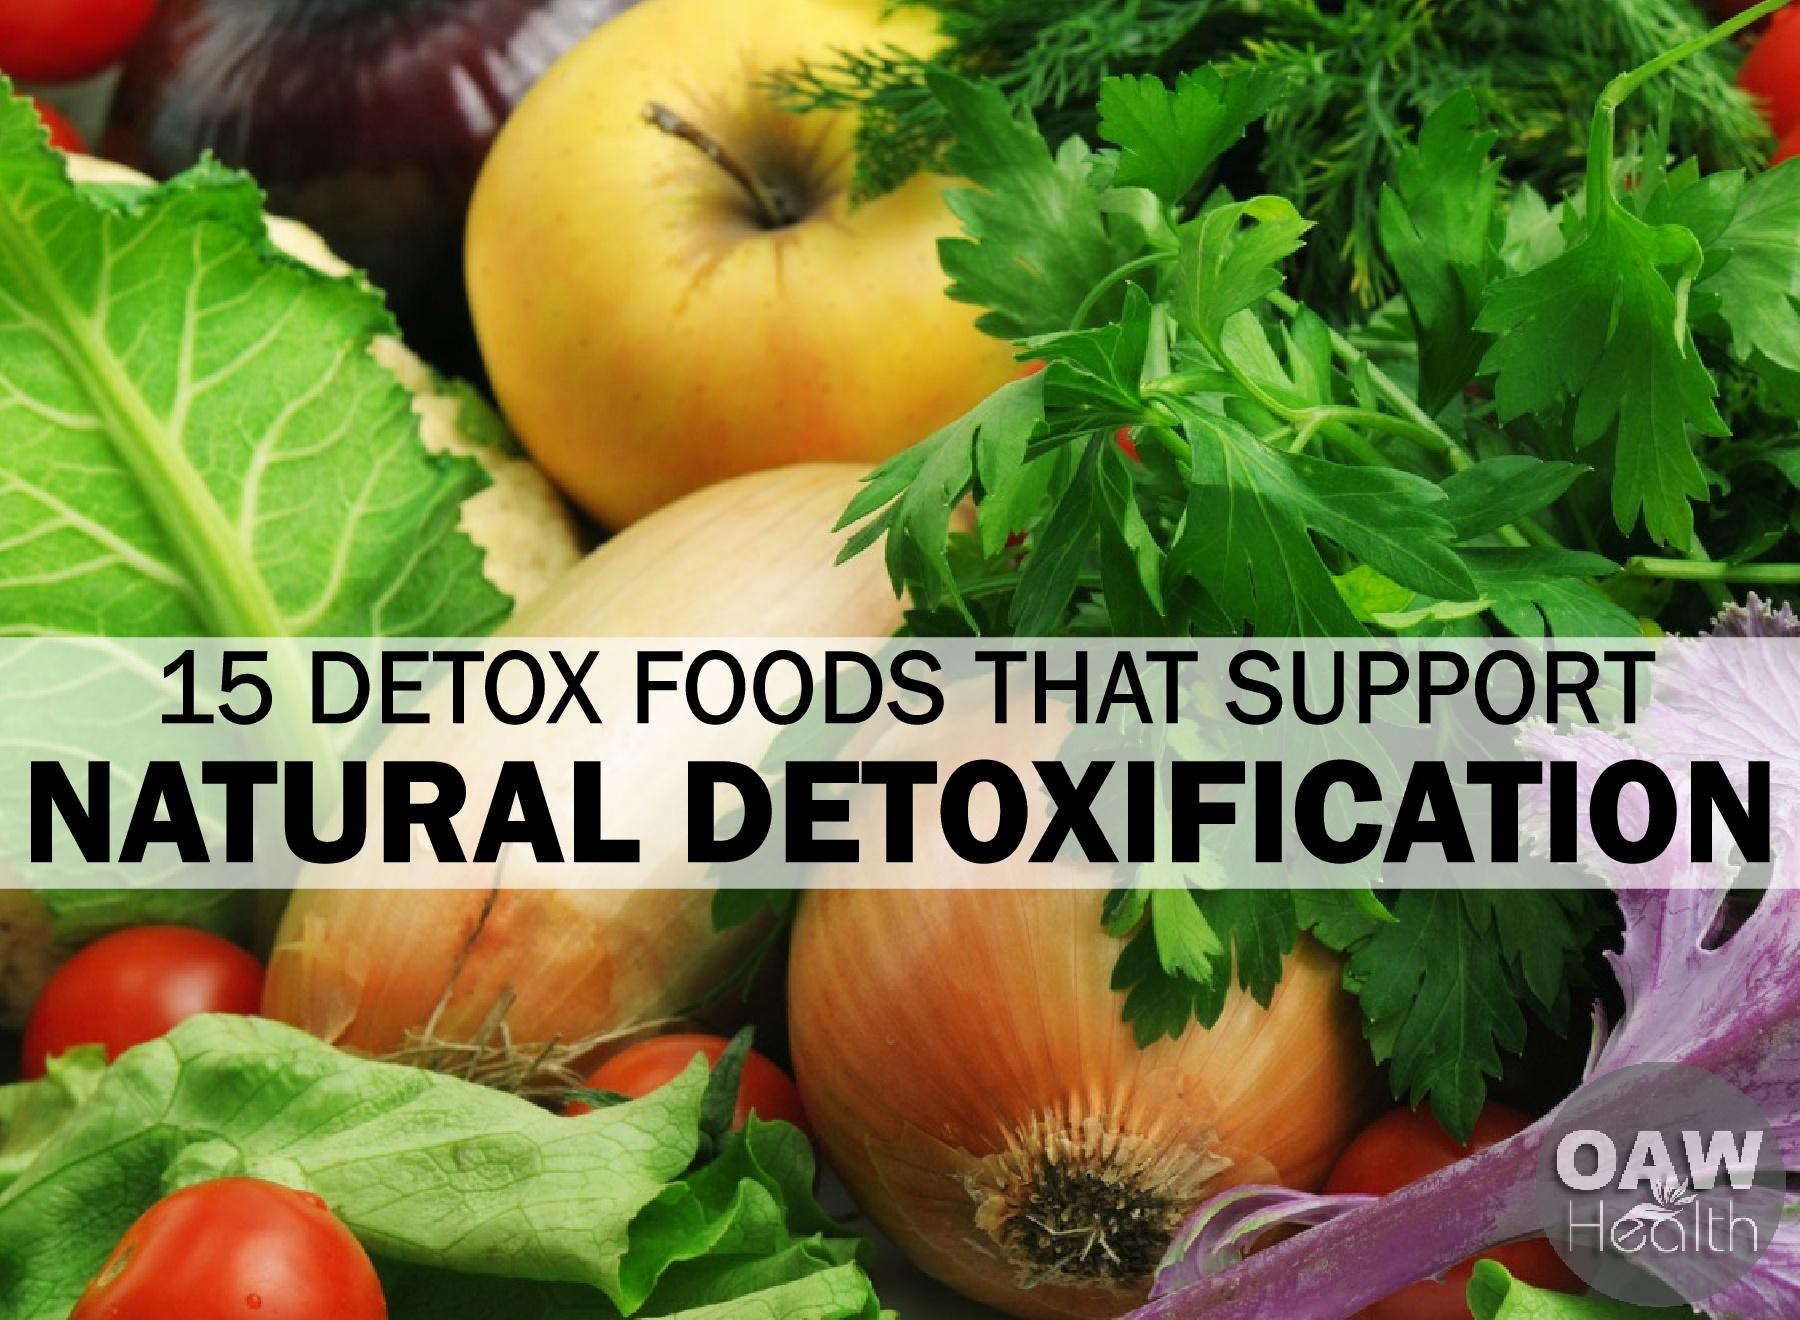 15 Detox Foods That Support Natural Detoxification